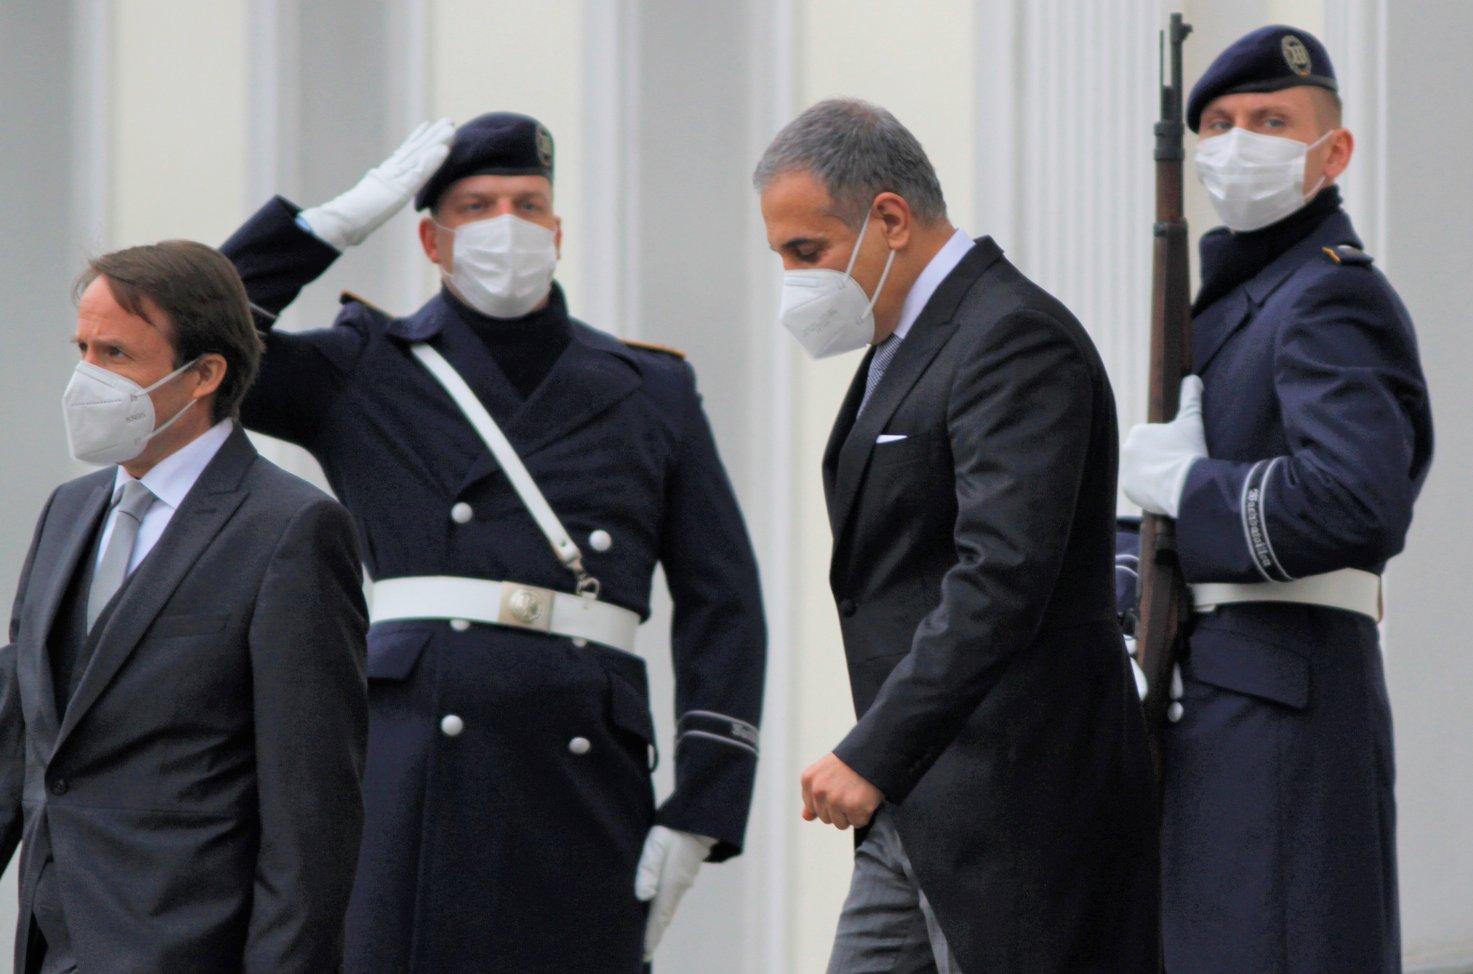 Botschafter der Islamischen Republik Afghanistan, Yama Yari, bei Bundespräsident Frank-Walter Steinmeier im Schloss Bellevue akkreditiert